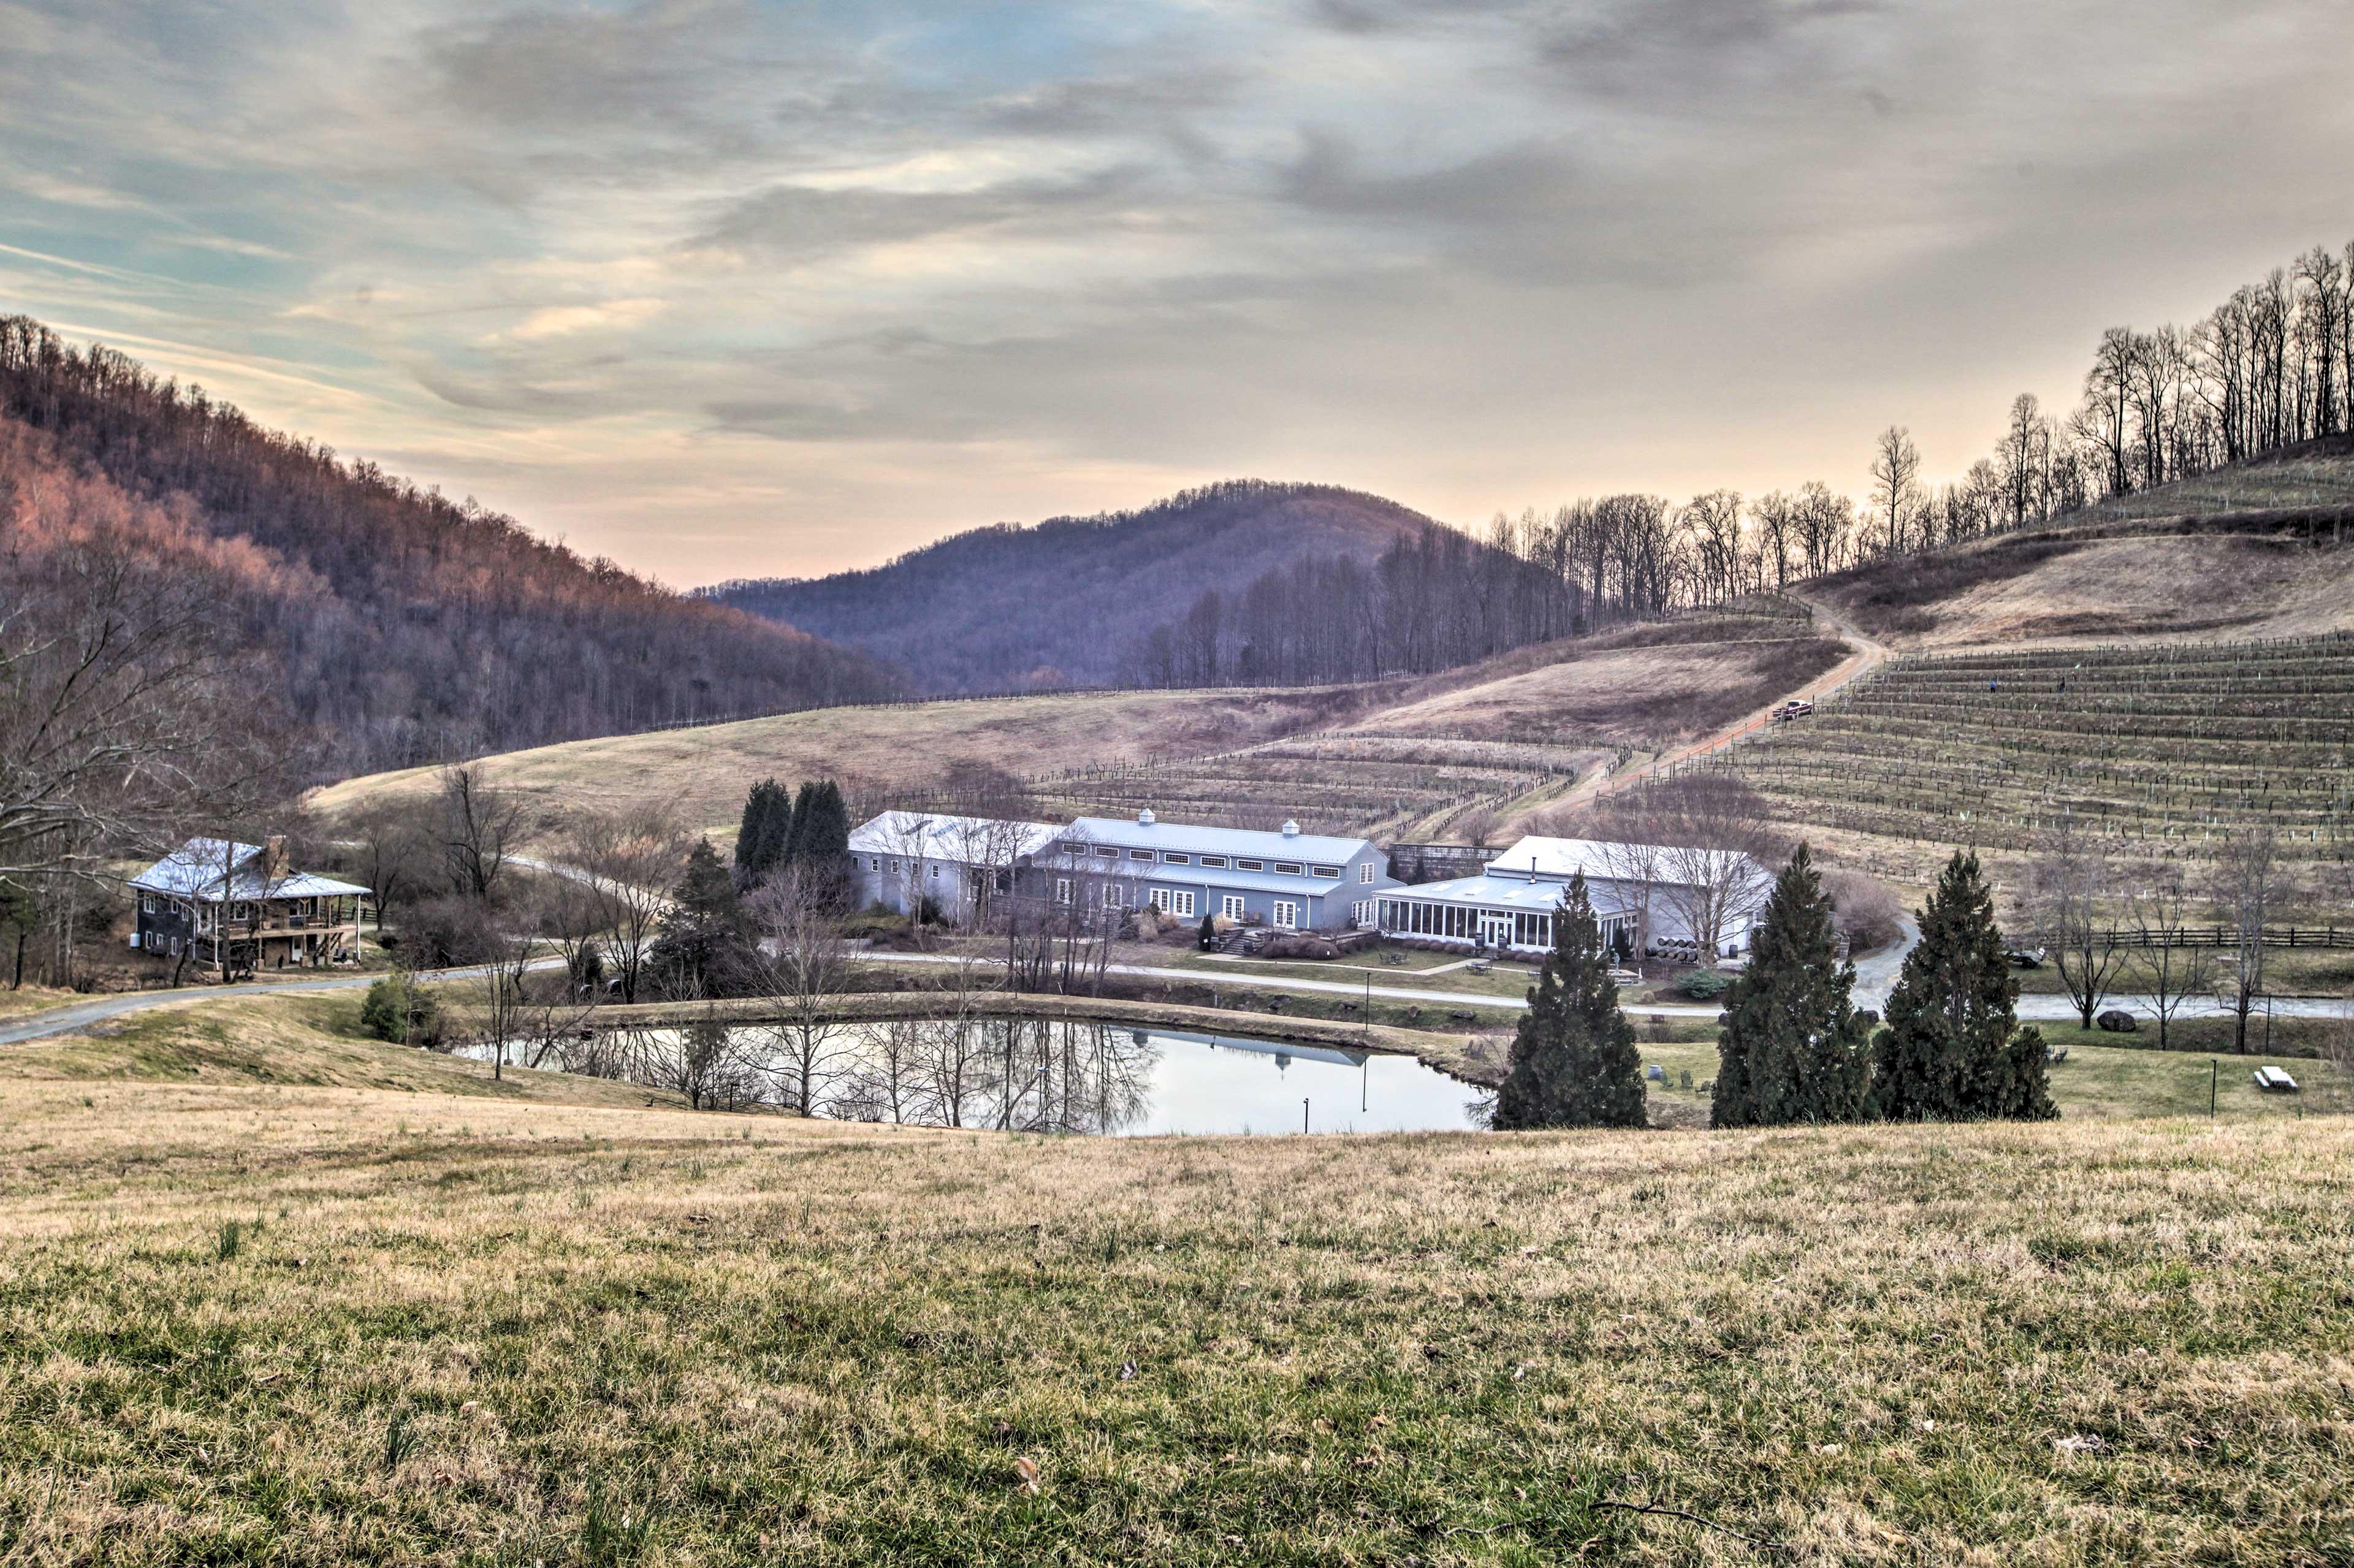 Delfosse Vineyards & Winery | 0.1 Miles Away